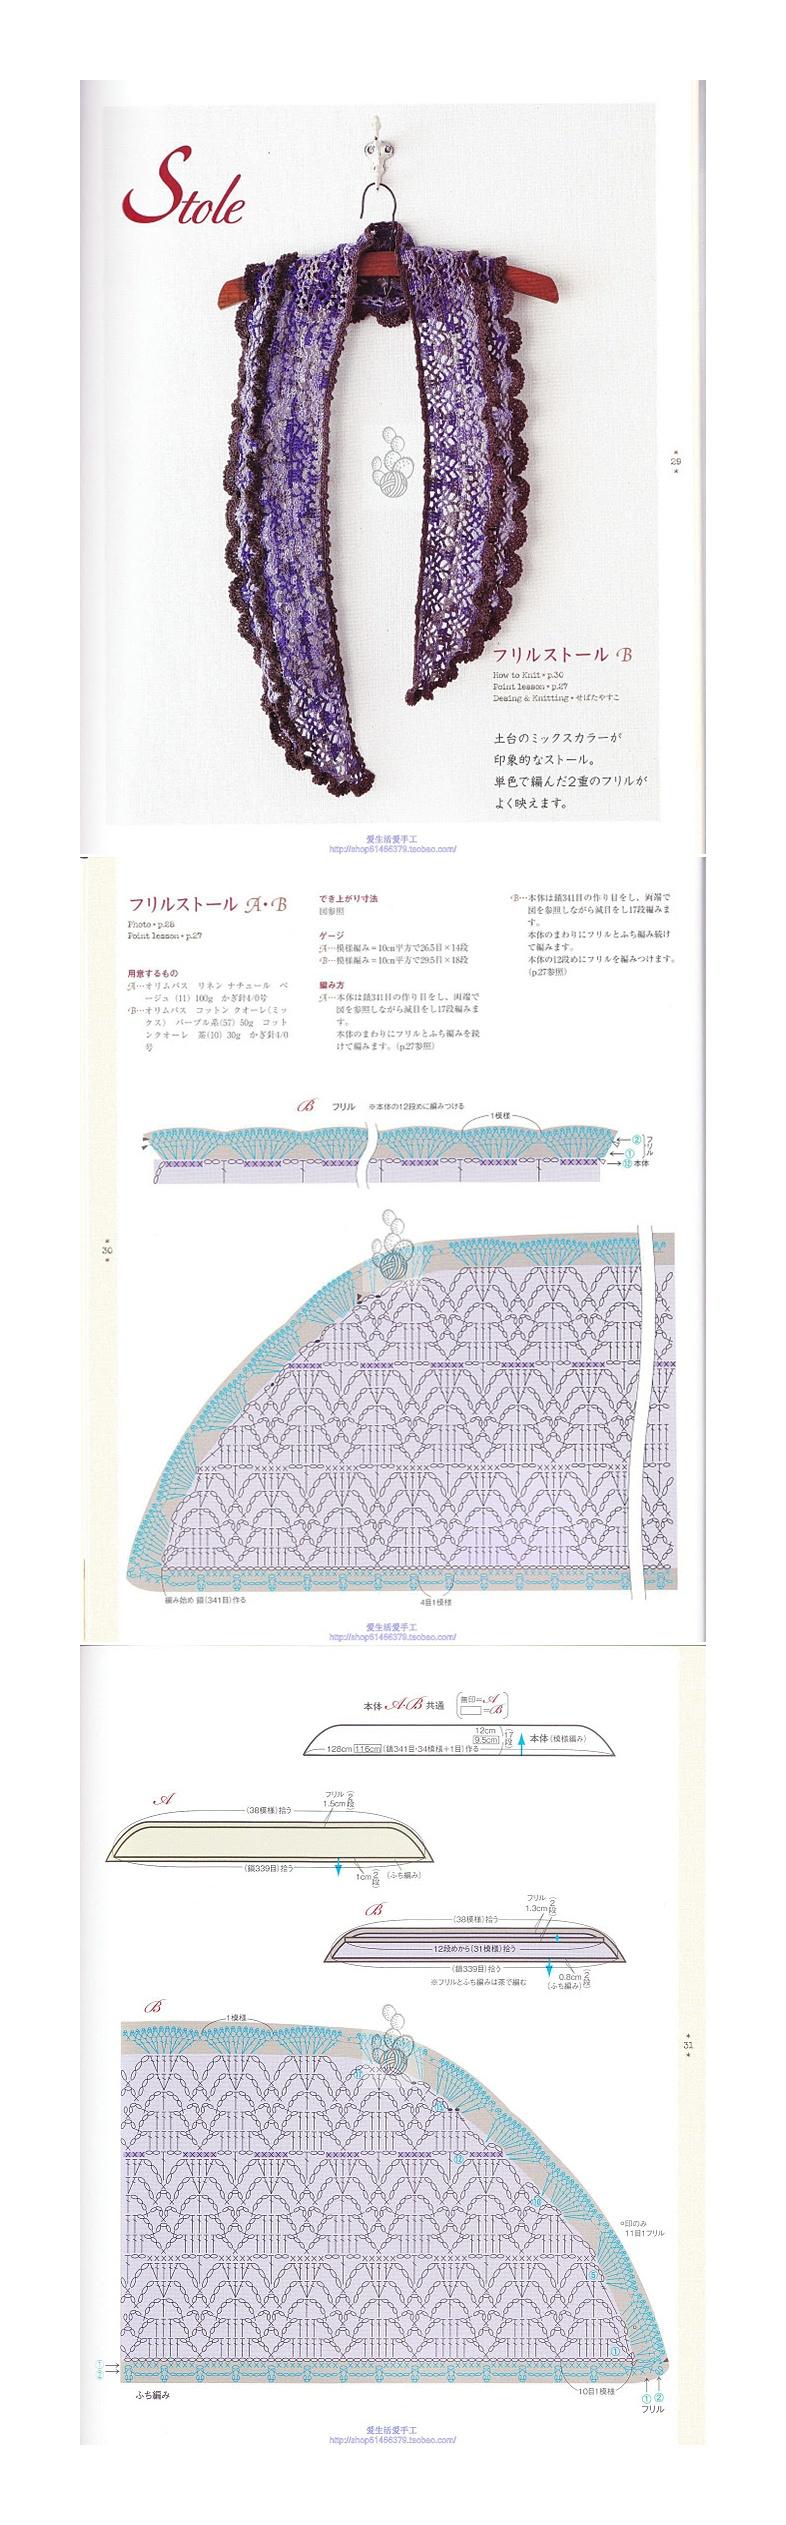 Crochet Shawl - Chart | Crochet | Pinterest | Chal, Ganchillo y Tejido